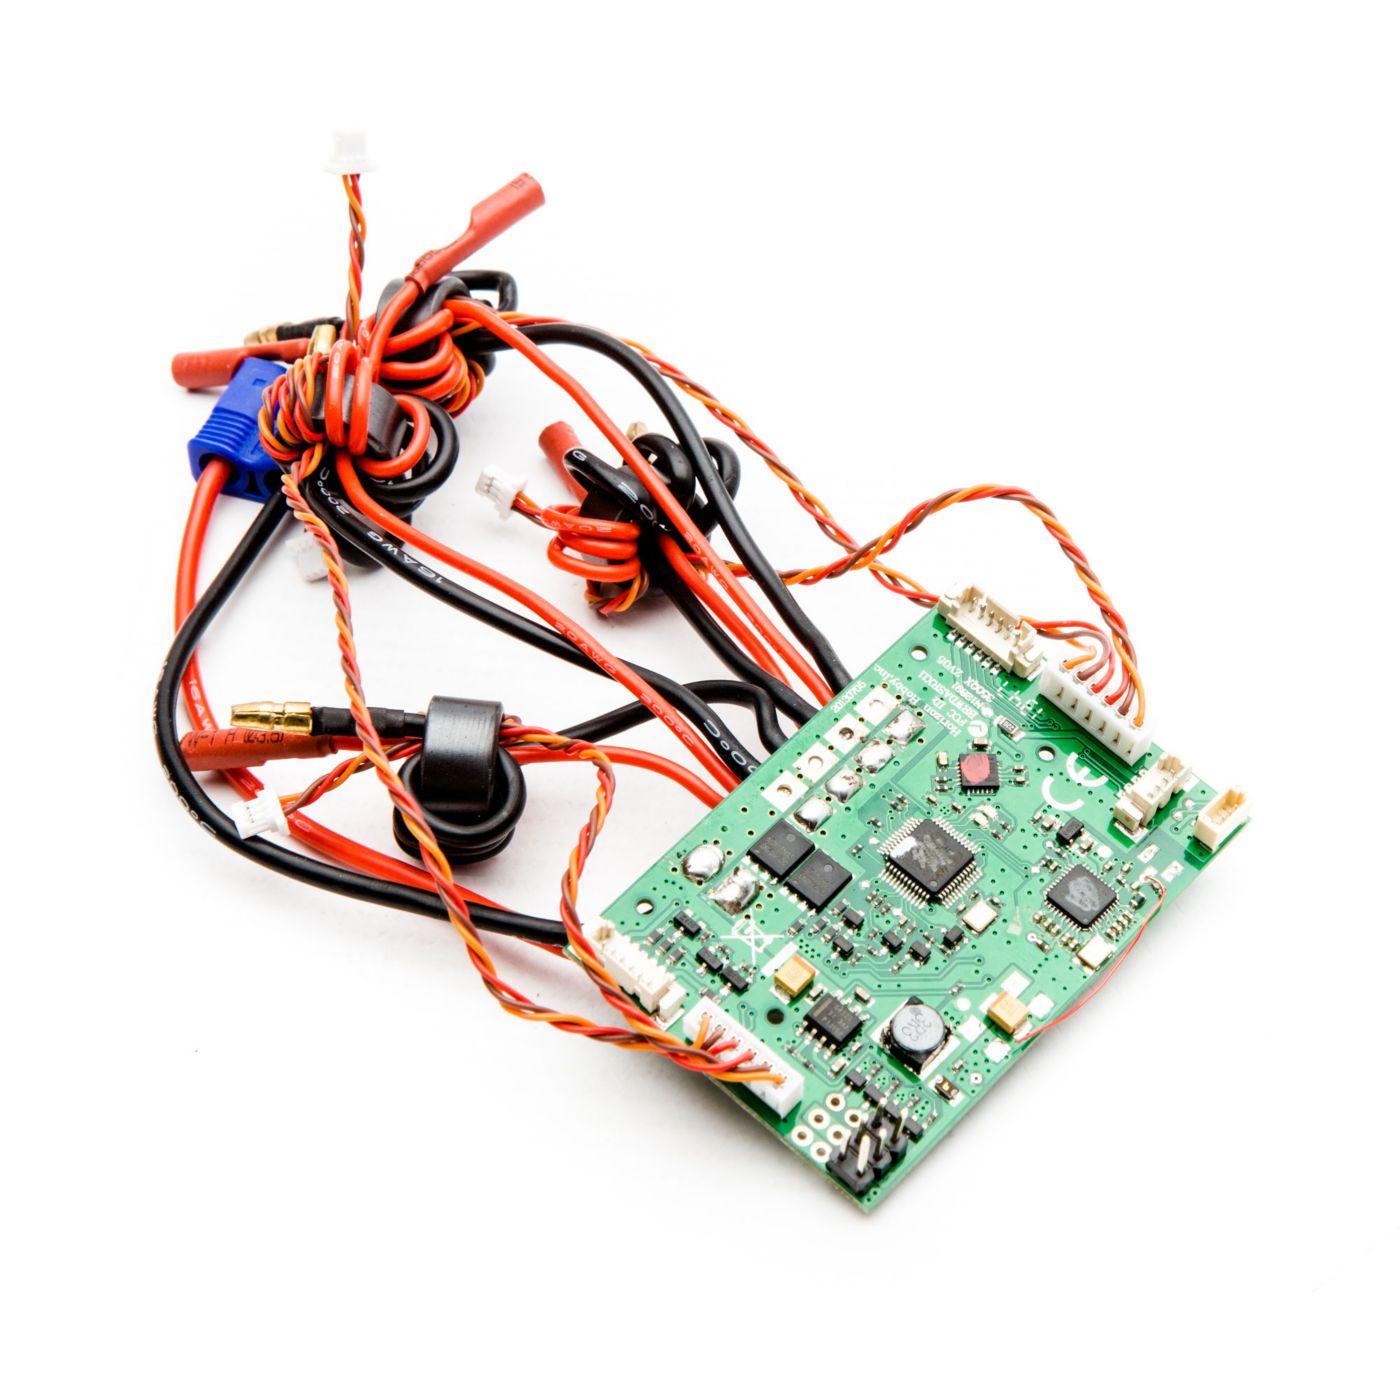 Item: Main Control Board:350 QX FW 2.0